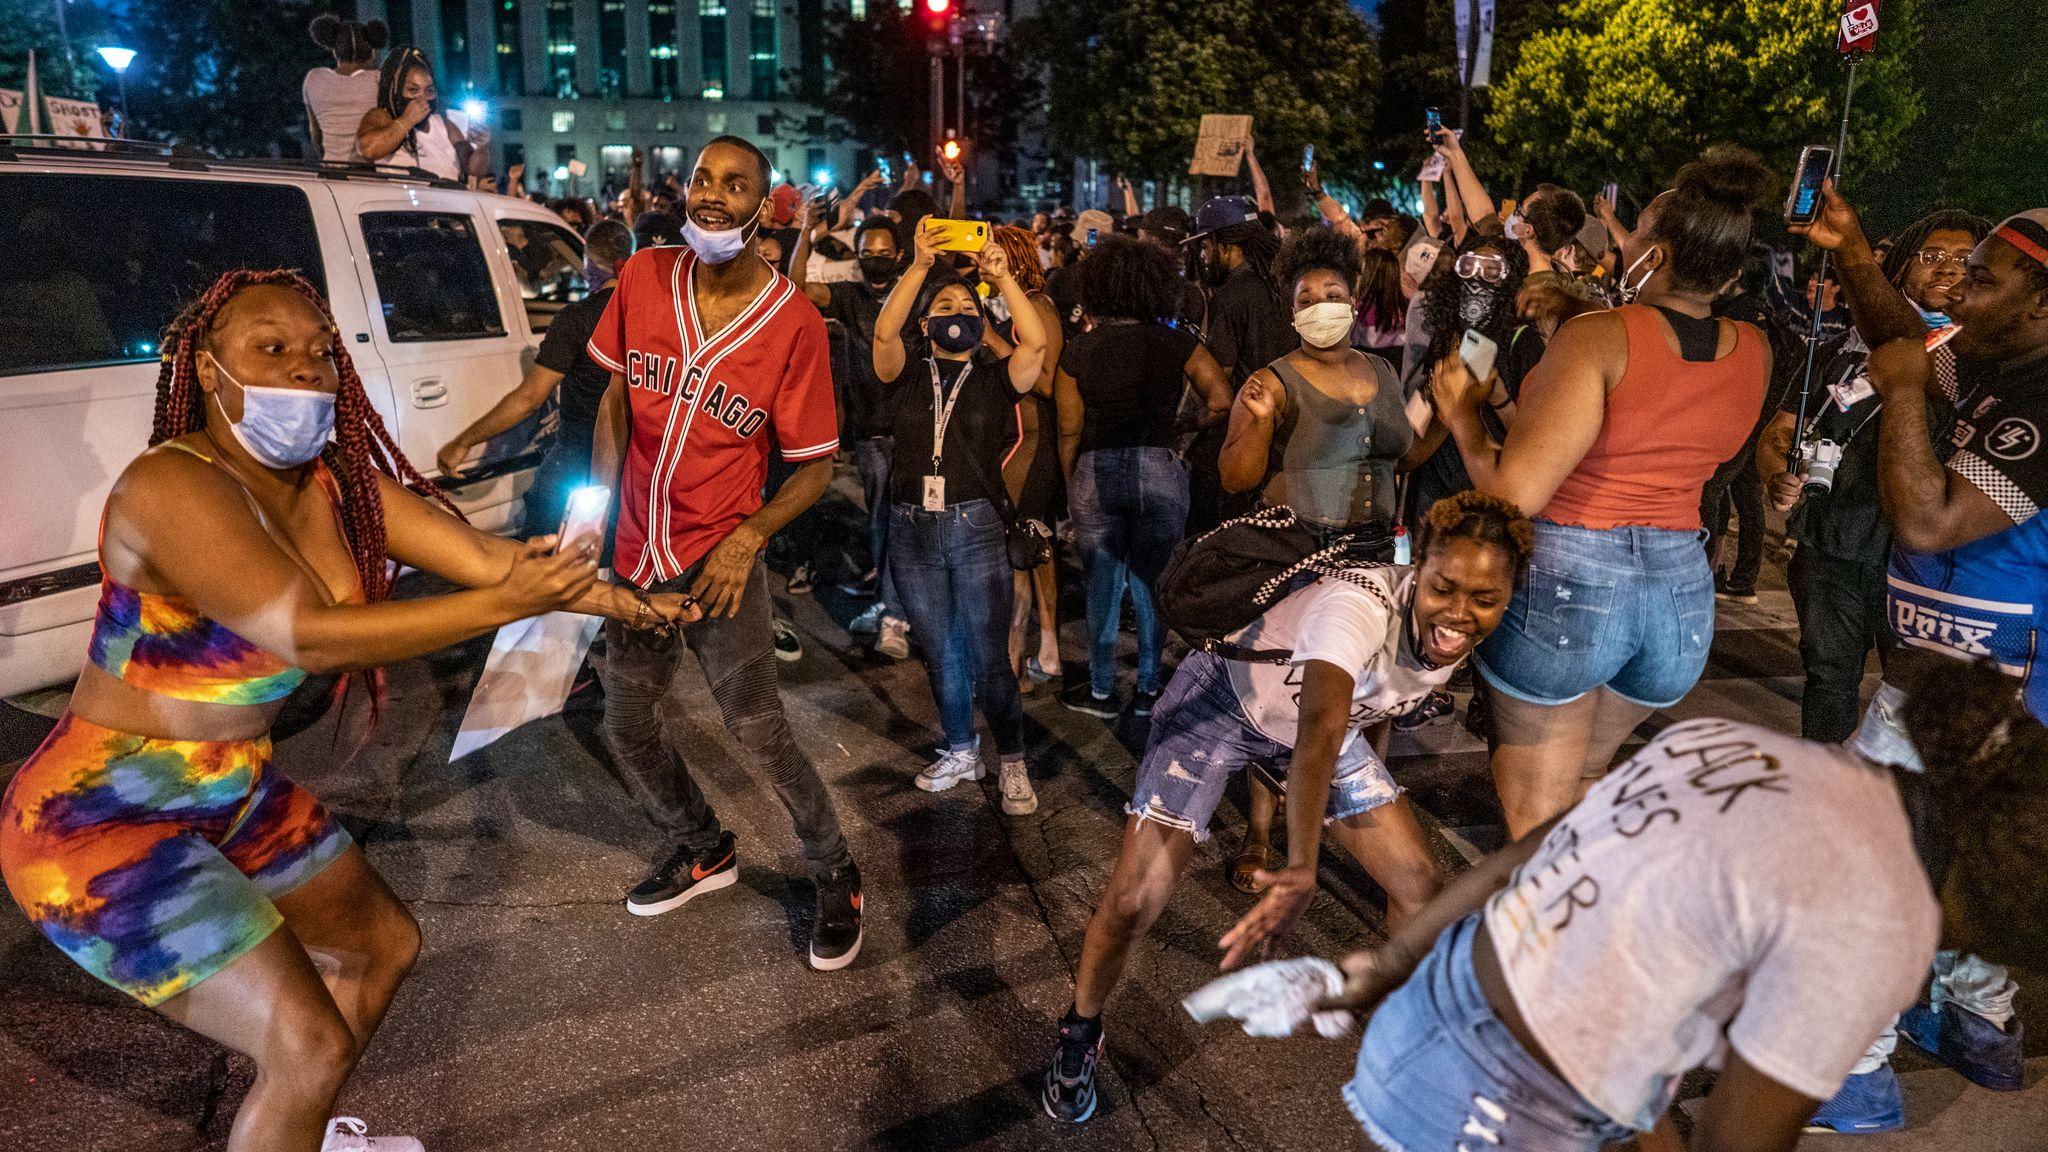 Nashville, Tenn., May 30 - Protestors in the streets of downtown Nashville. (Photo: John Partipilo)